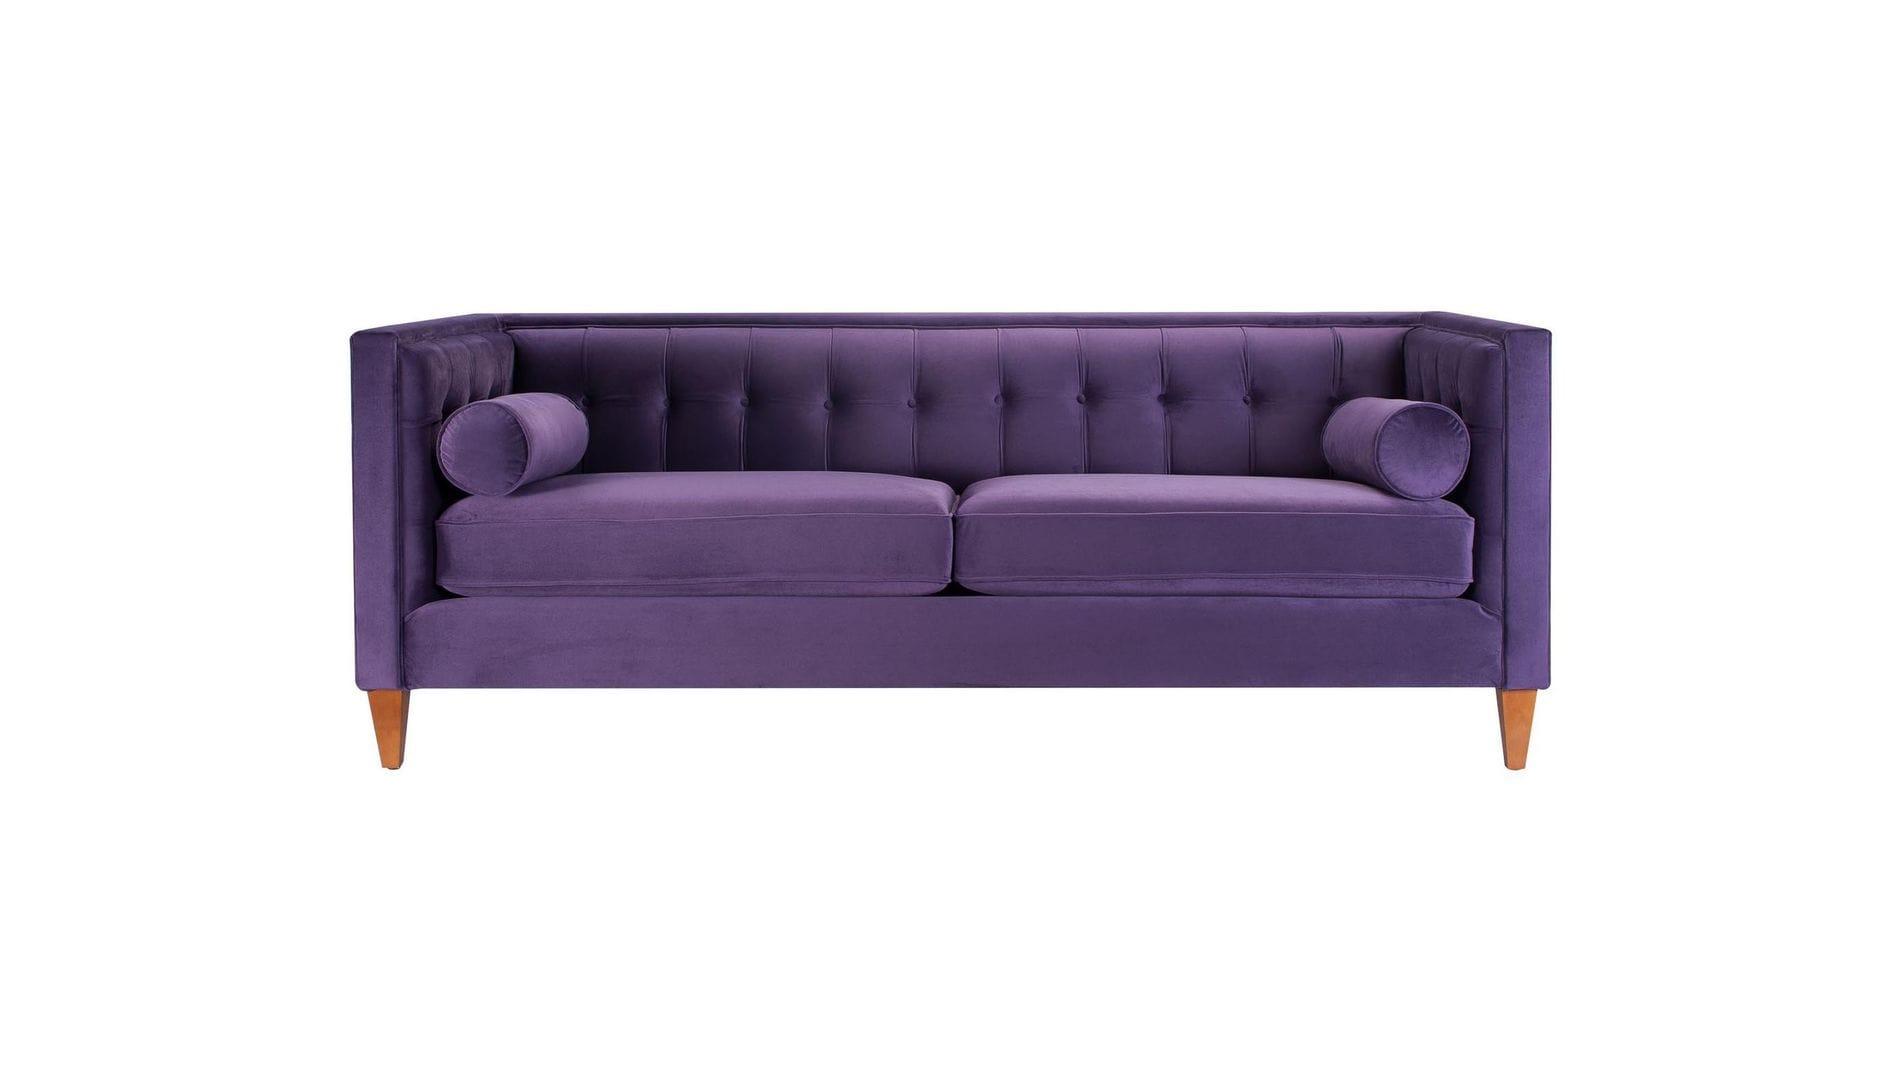 Диван Jack трехместный Пурпурный Велюр Р